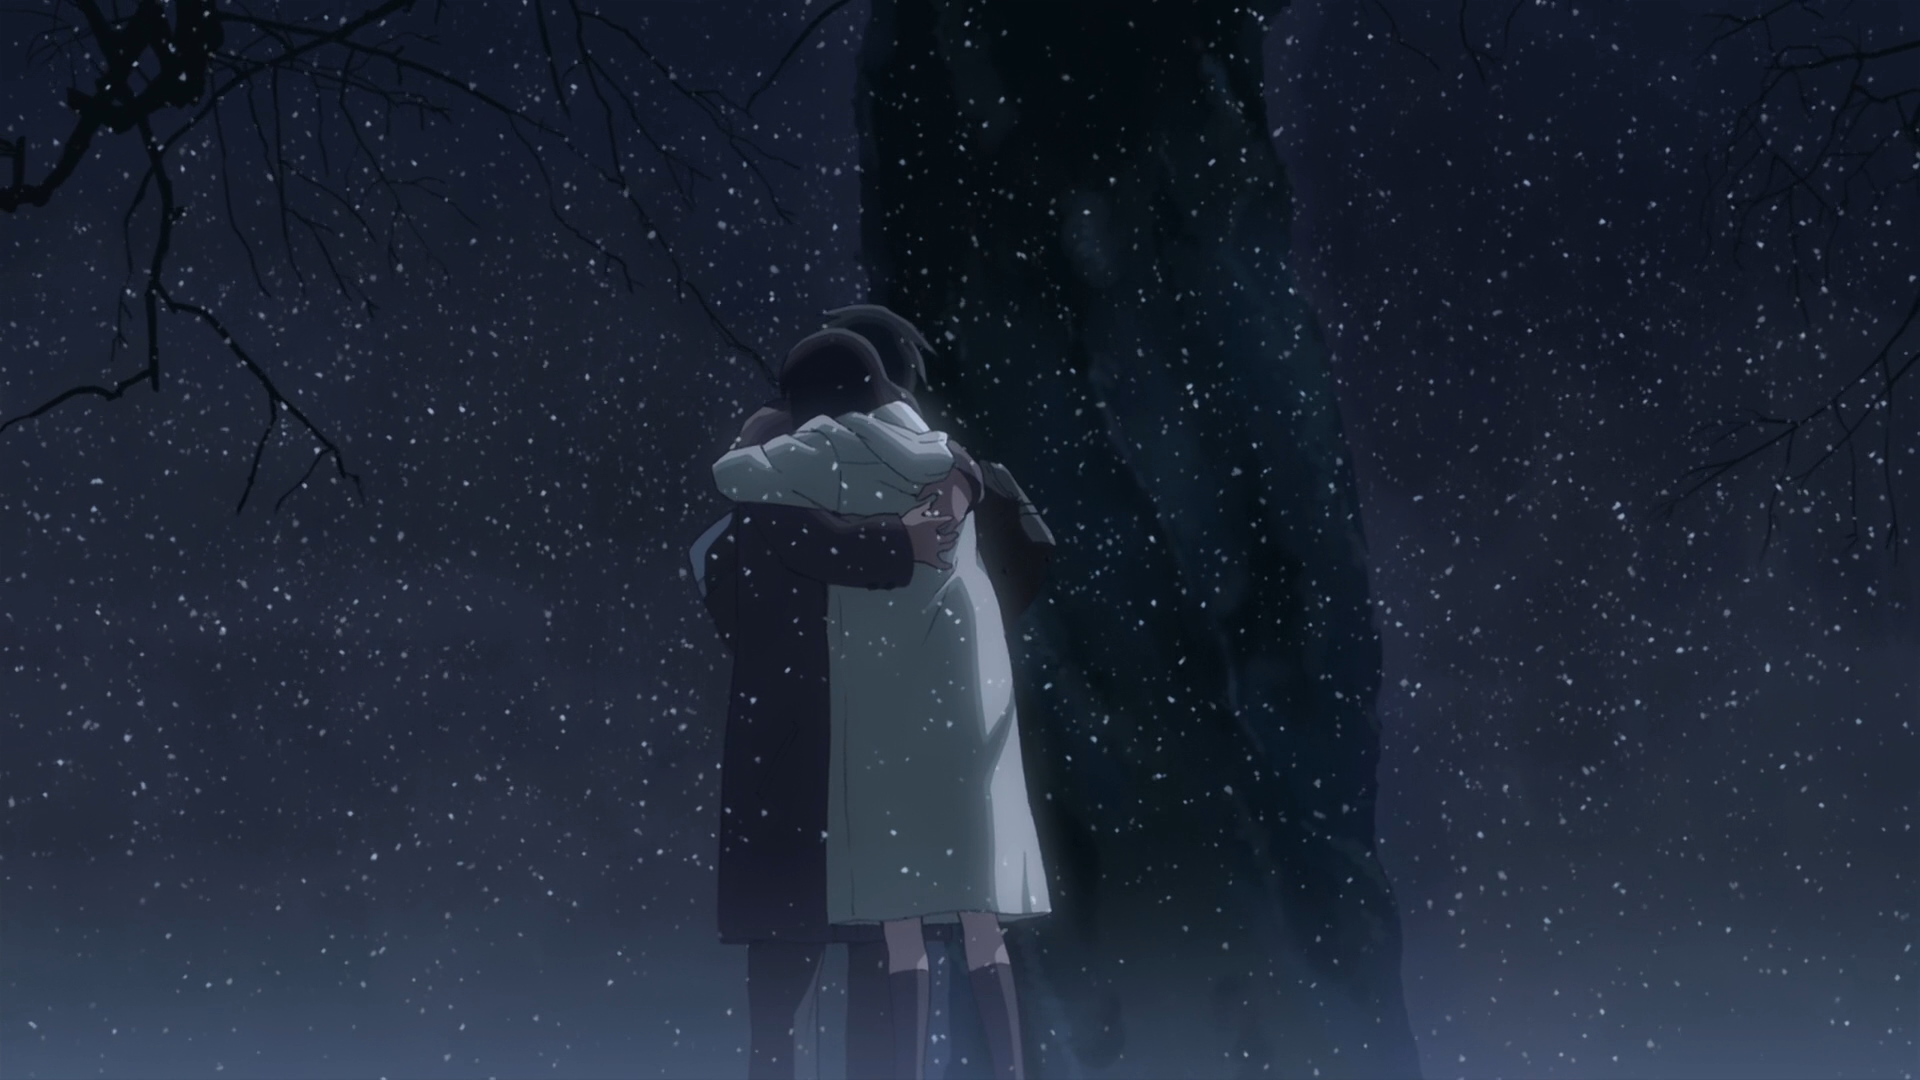 Makoto Shinkai Embrace 5 Centimeters Per Second Hugging Free